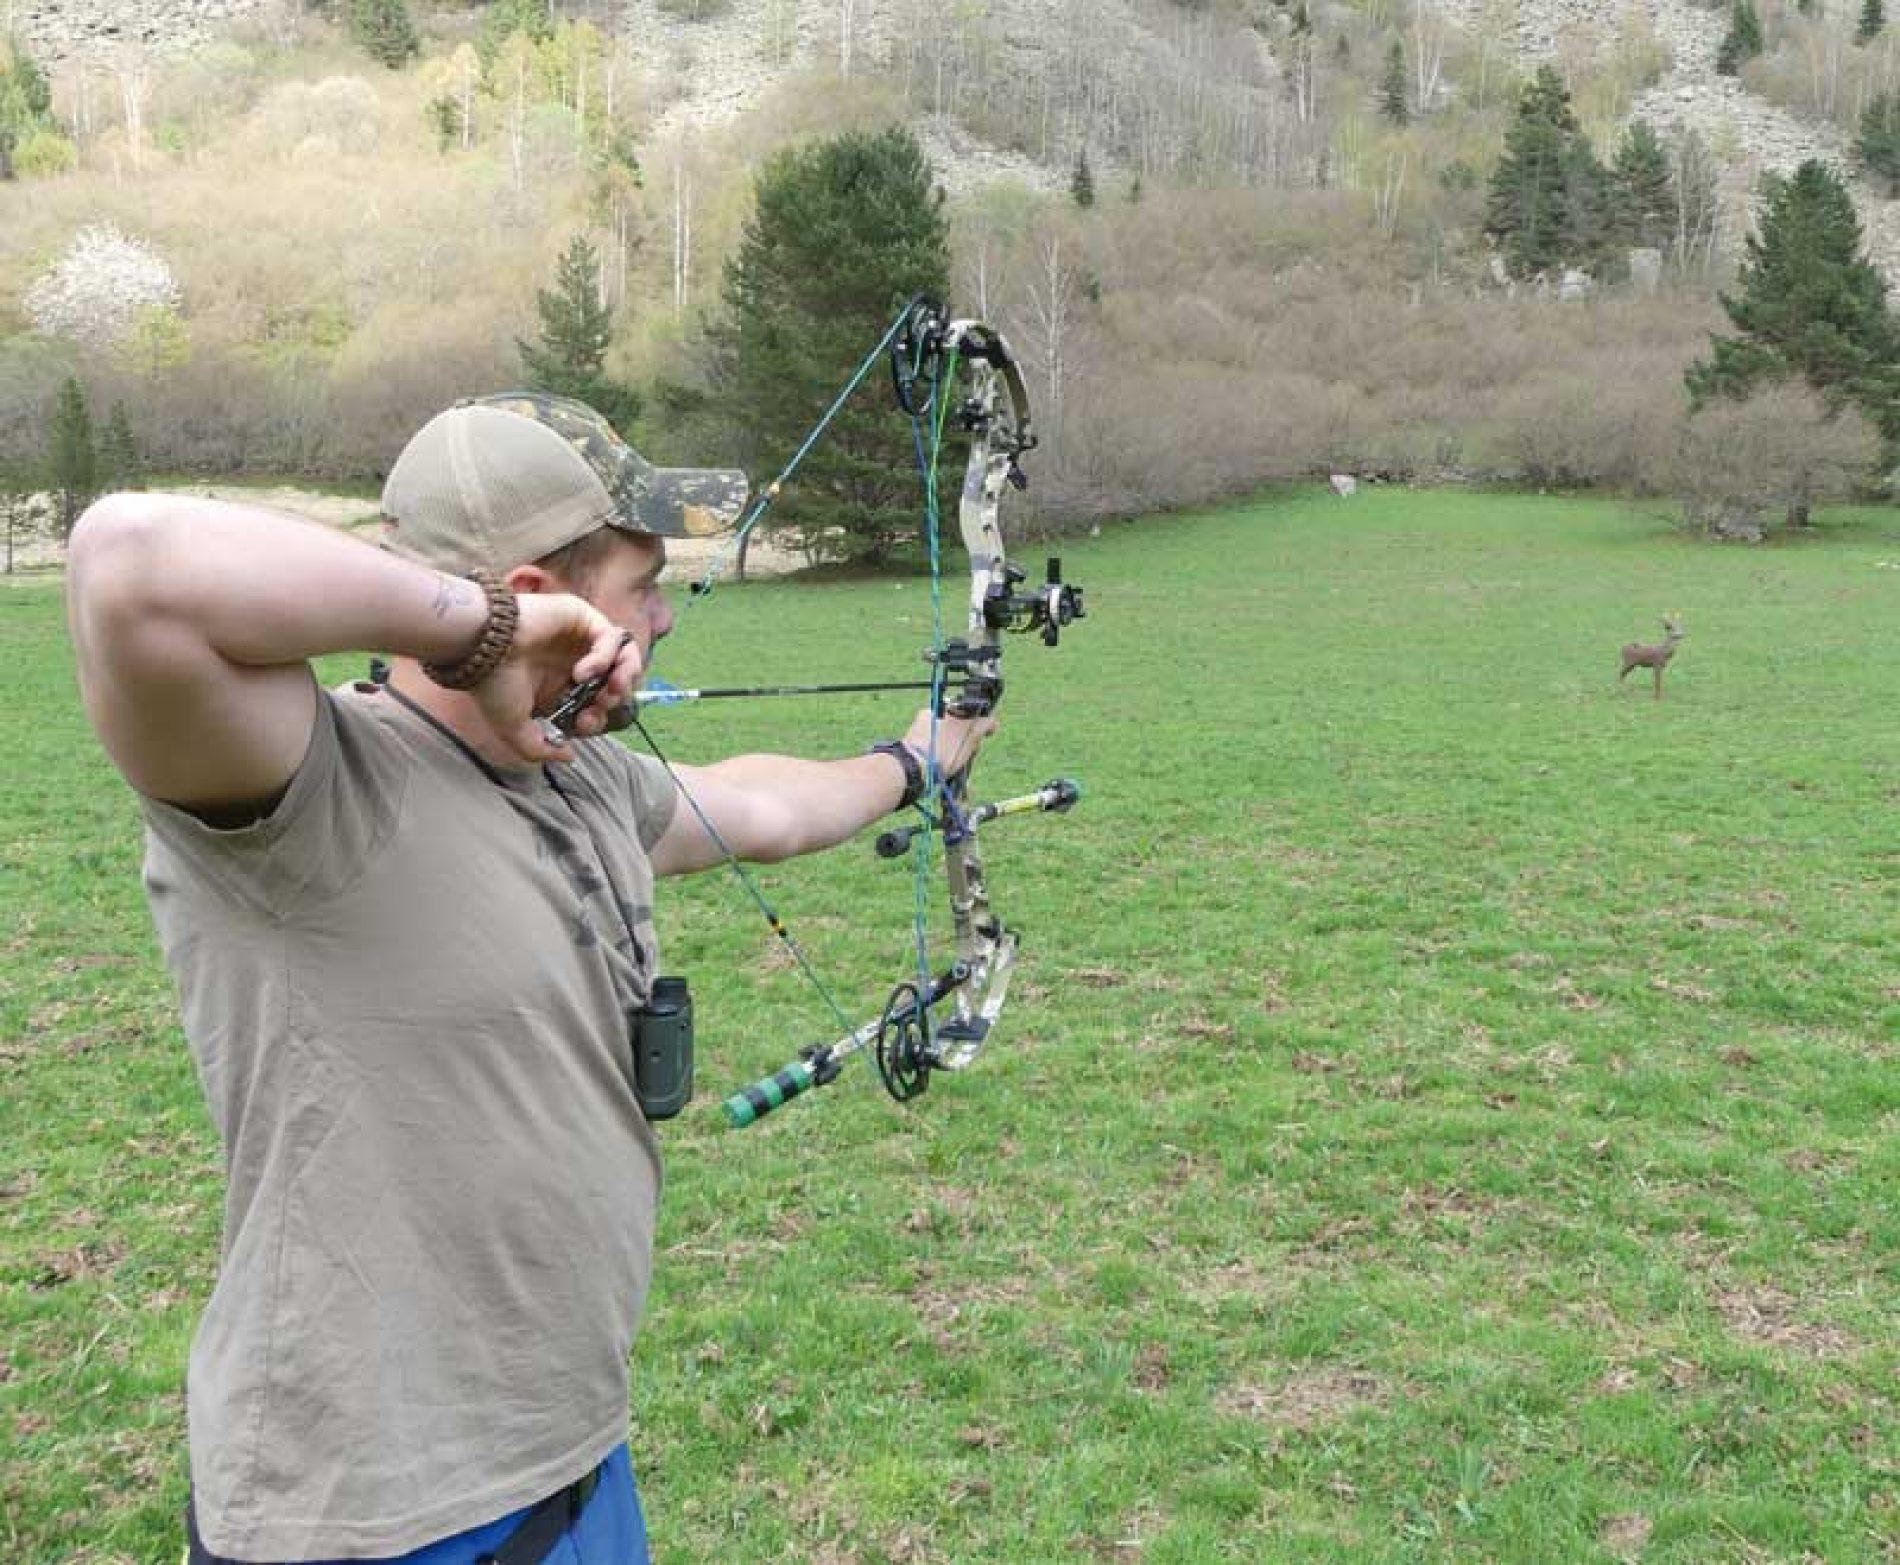 10 pasos imprescindibles para tener éxito en el tiro con arco